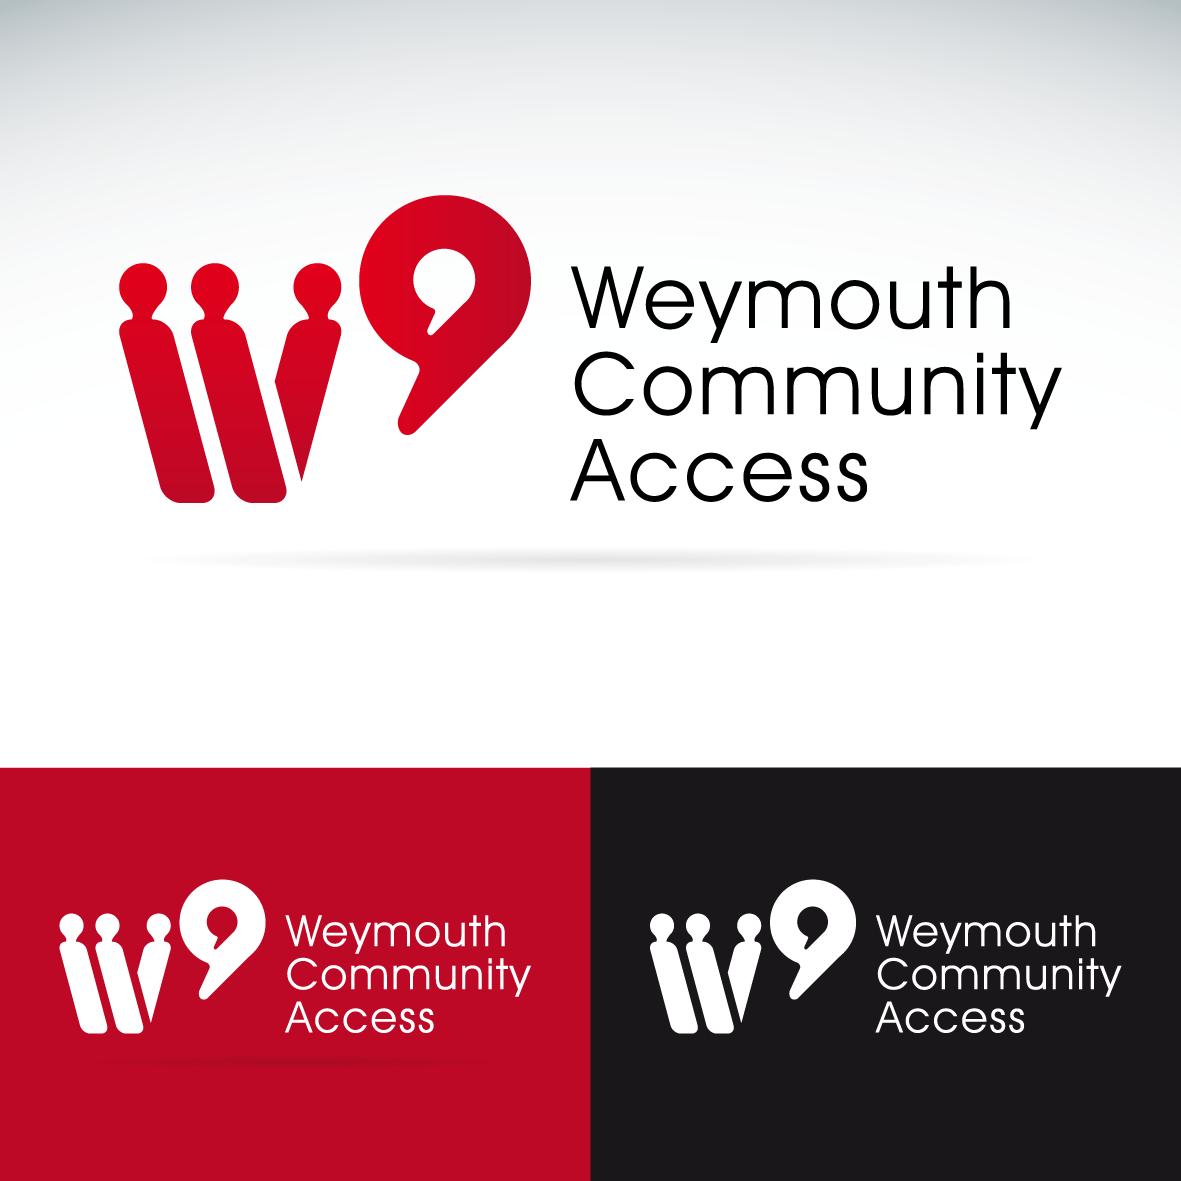 logo for Weymouth Community Access (WCA-9)